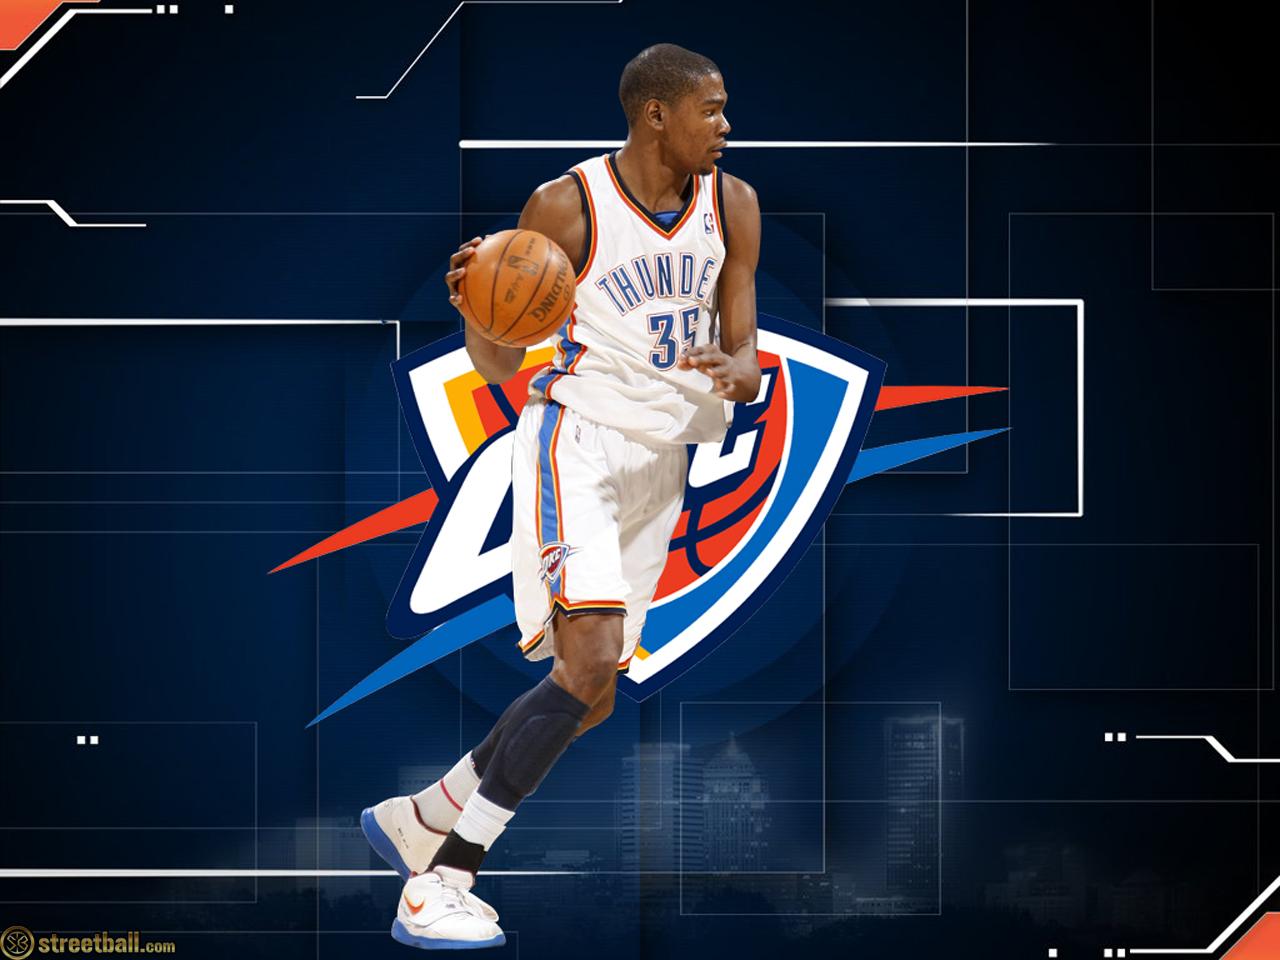 Basketball Kevin Durant Wallpapers: Oklahoma City Thunder Kevin Durant Wallpaper #6175 At